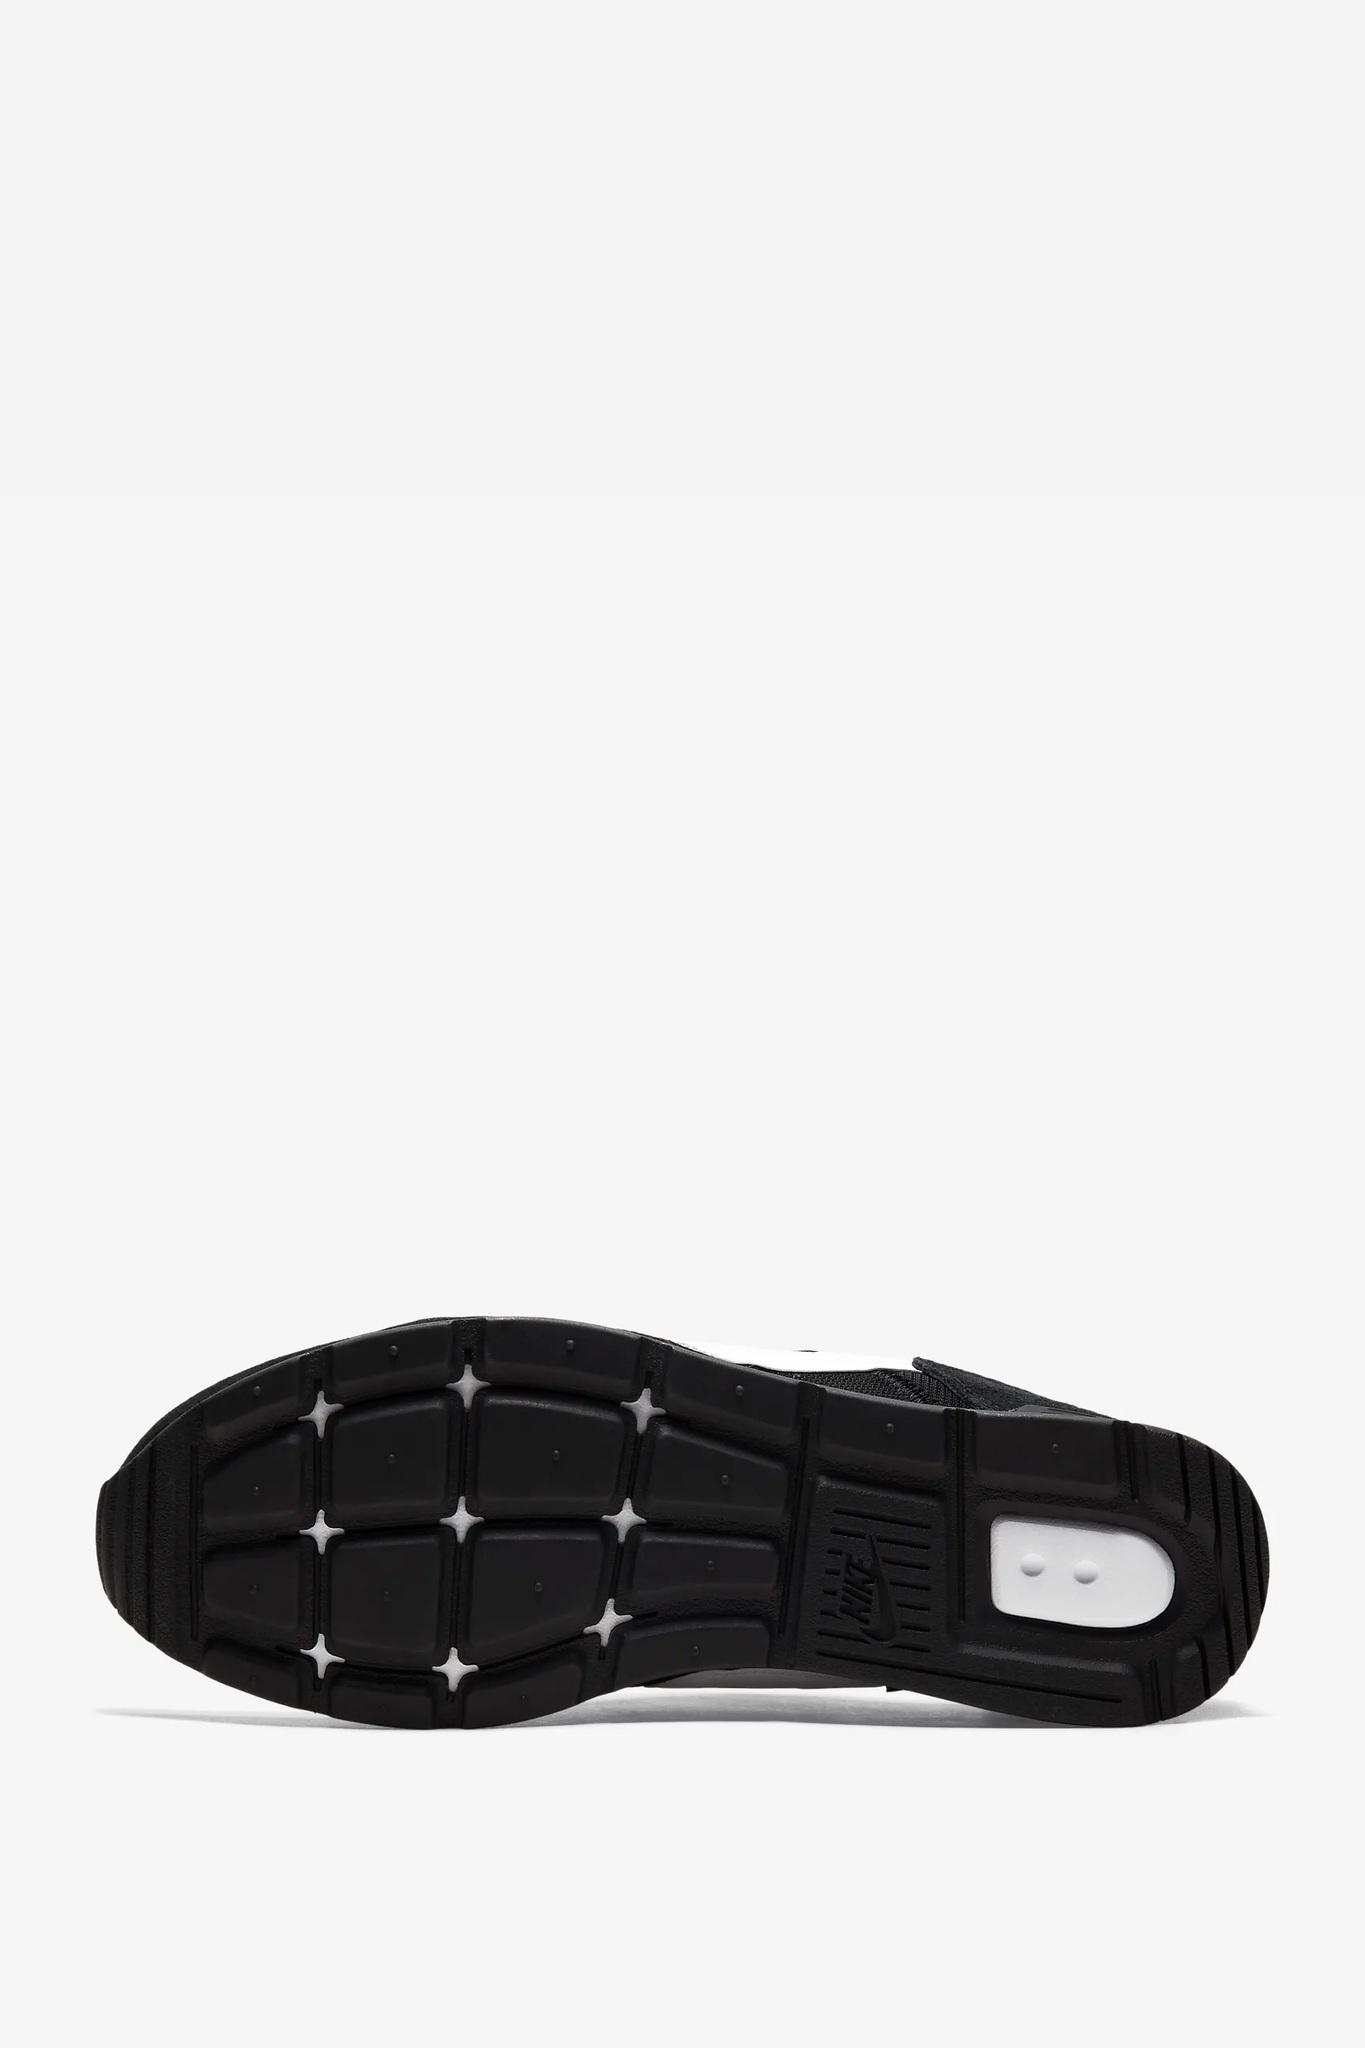 Купить Nike Venture Runner CK2944-002 219361700-5678